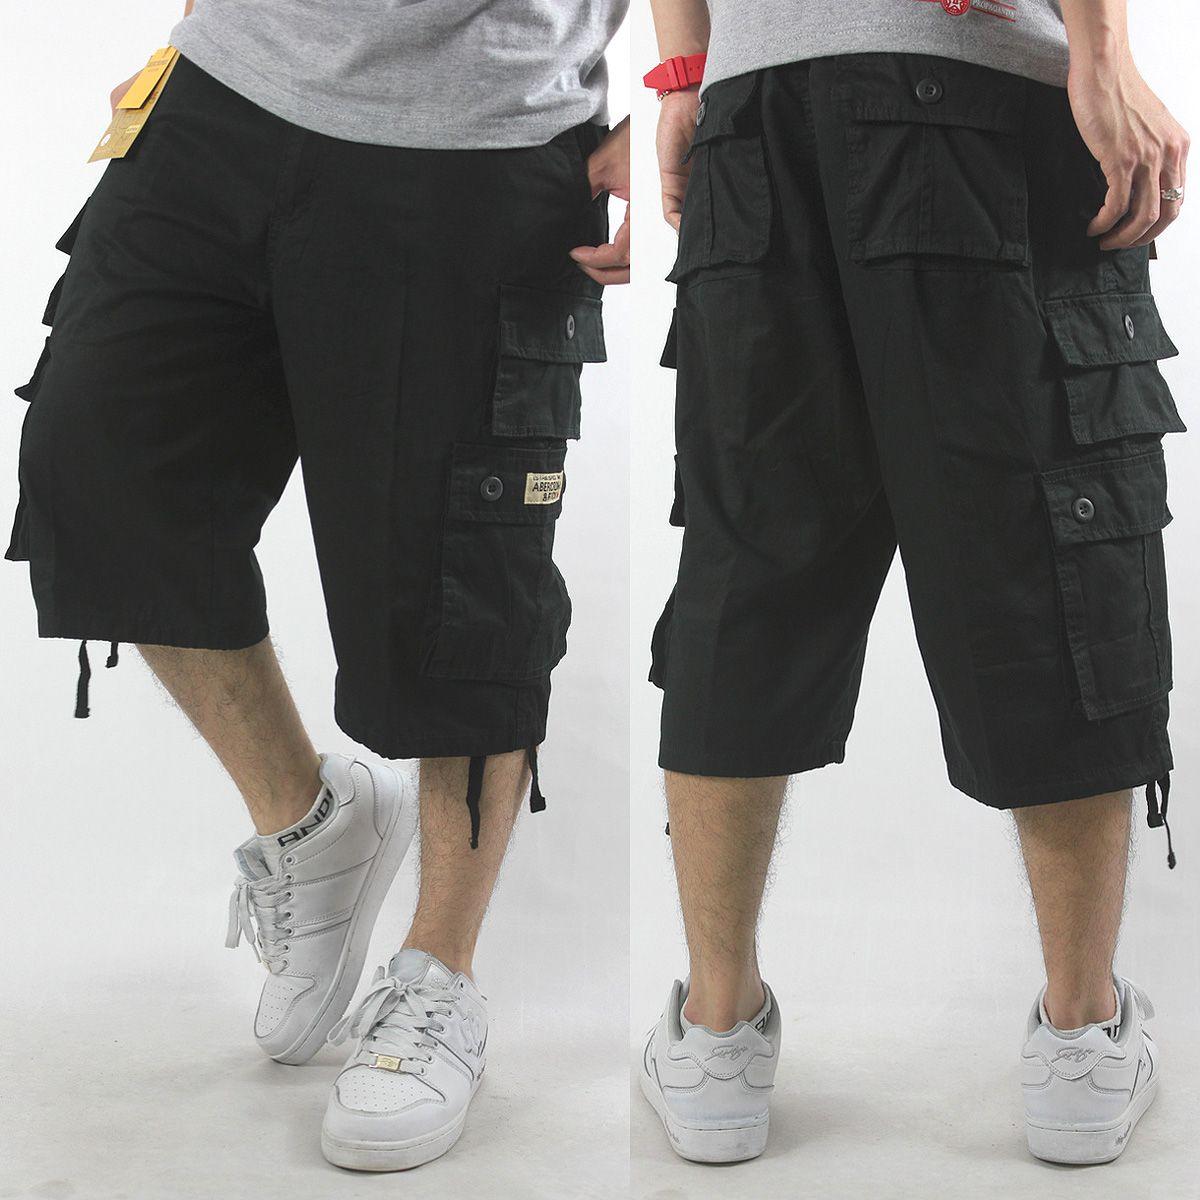 Mens casual fashion 2013 casual fashion mens cargo shorts plus mens casual fashion 2013 casual fashion mens cargo shorts plus size loose capris shorts malvernweather Gallery